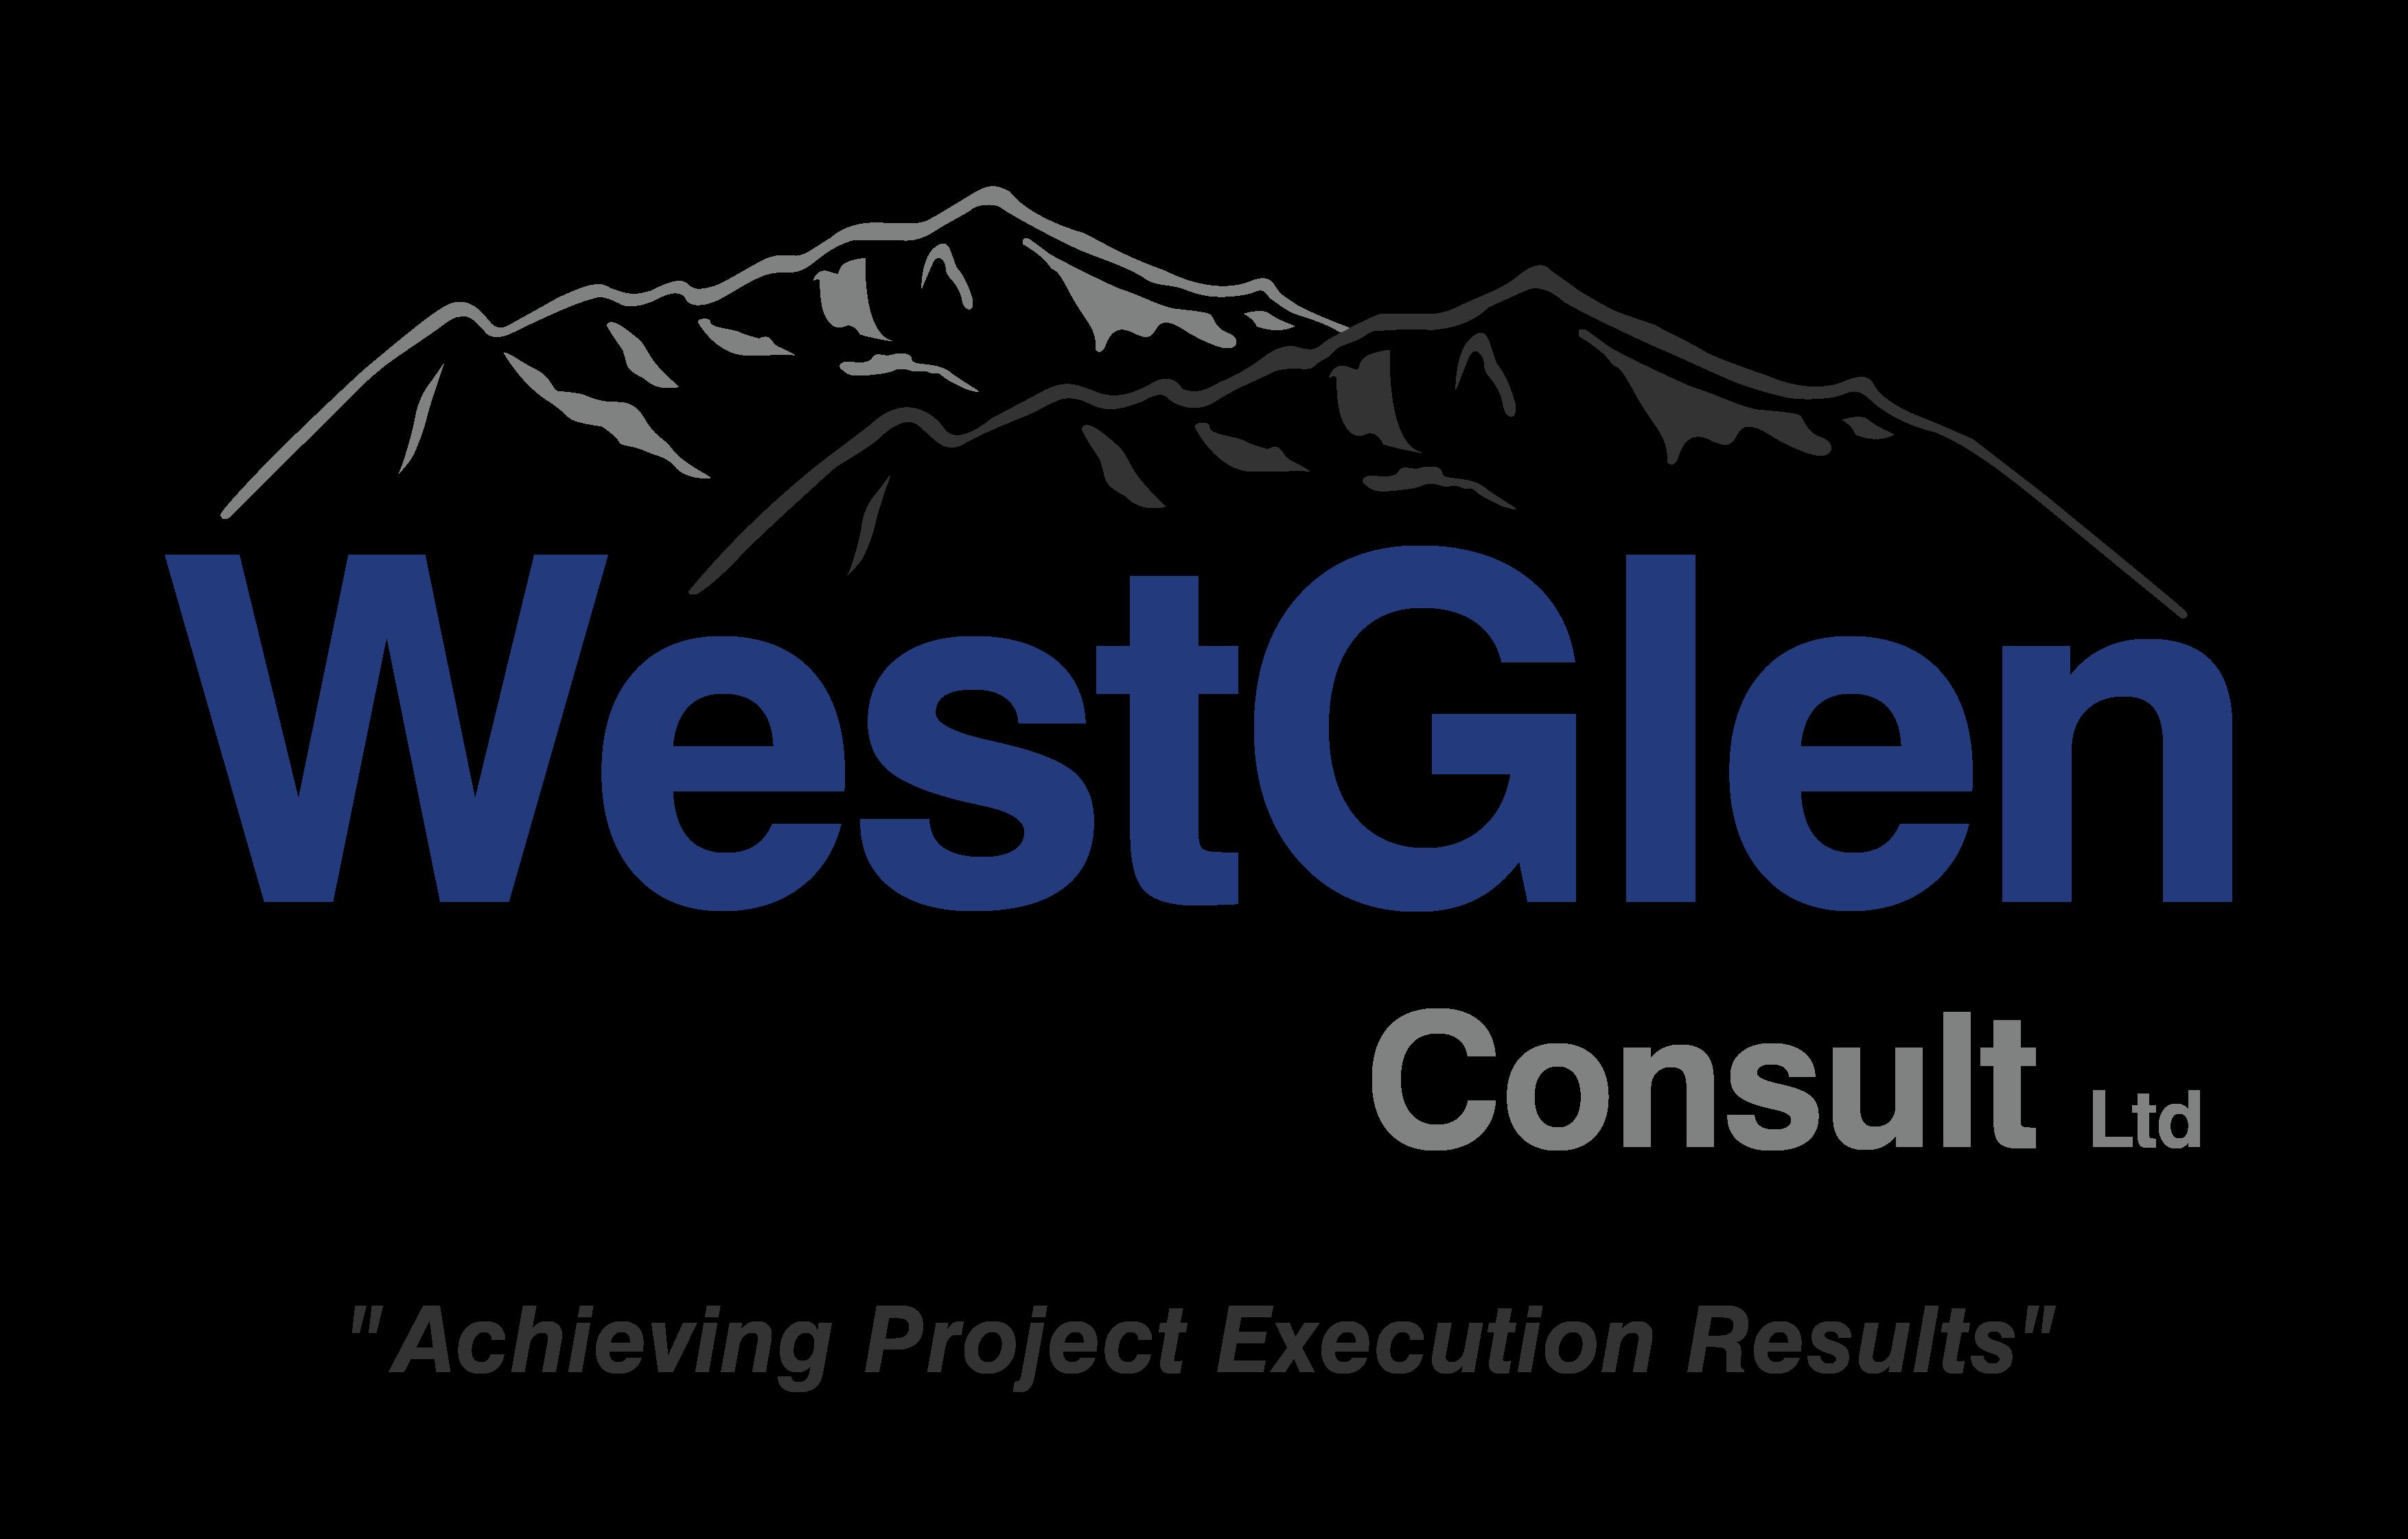 WestGlen Consult